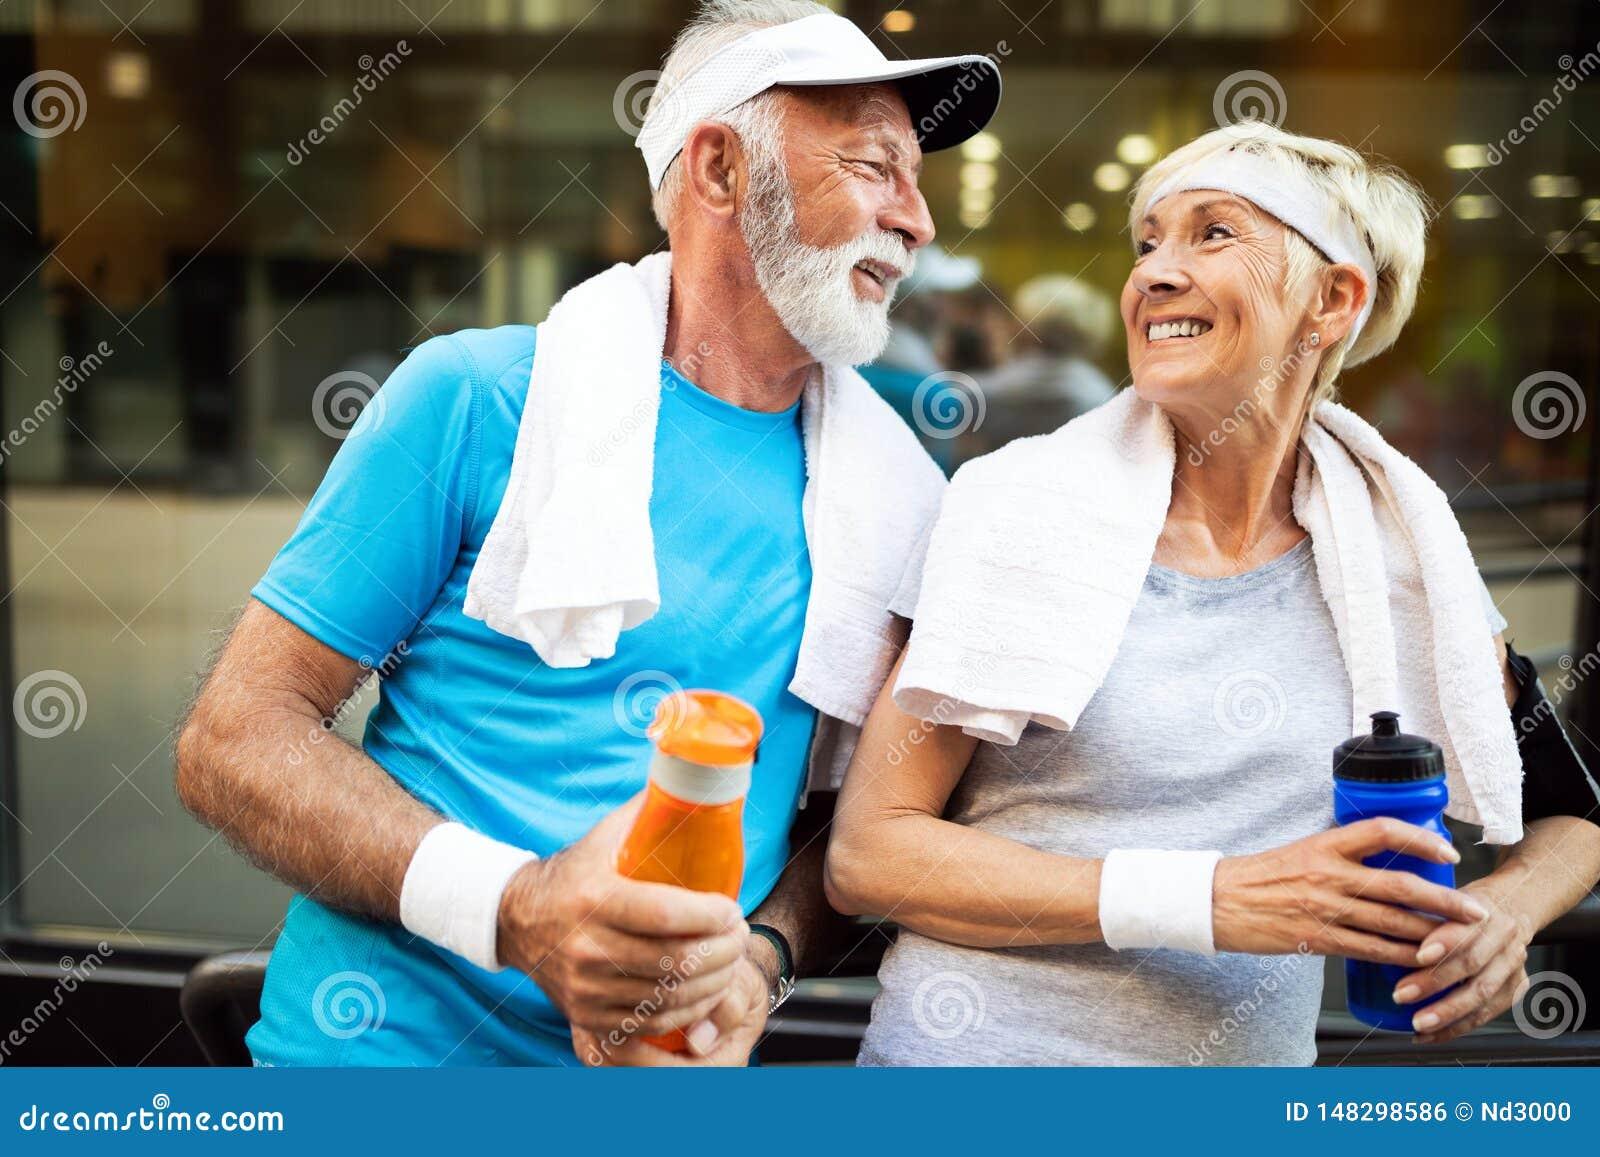 Sunt h?gt, par som joggar i staden p? ottan med soluppg?ng